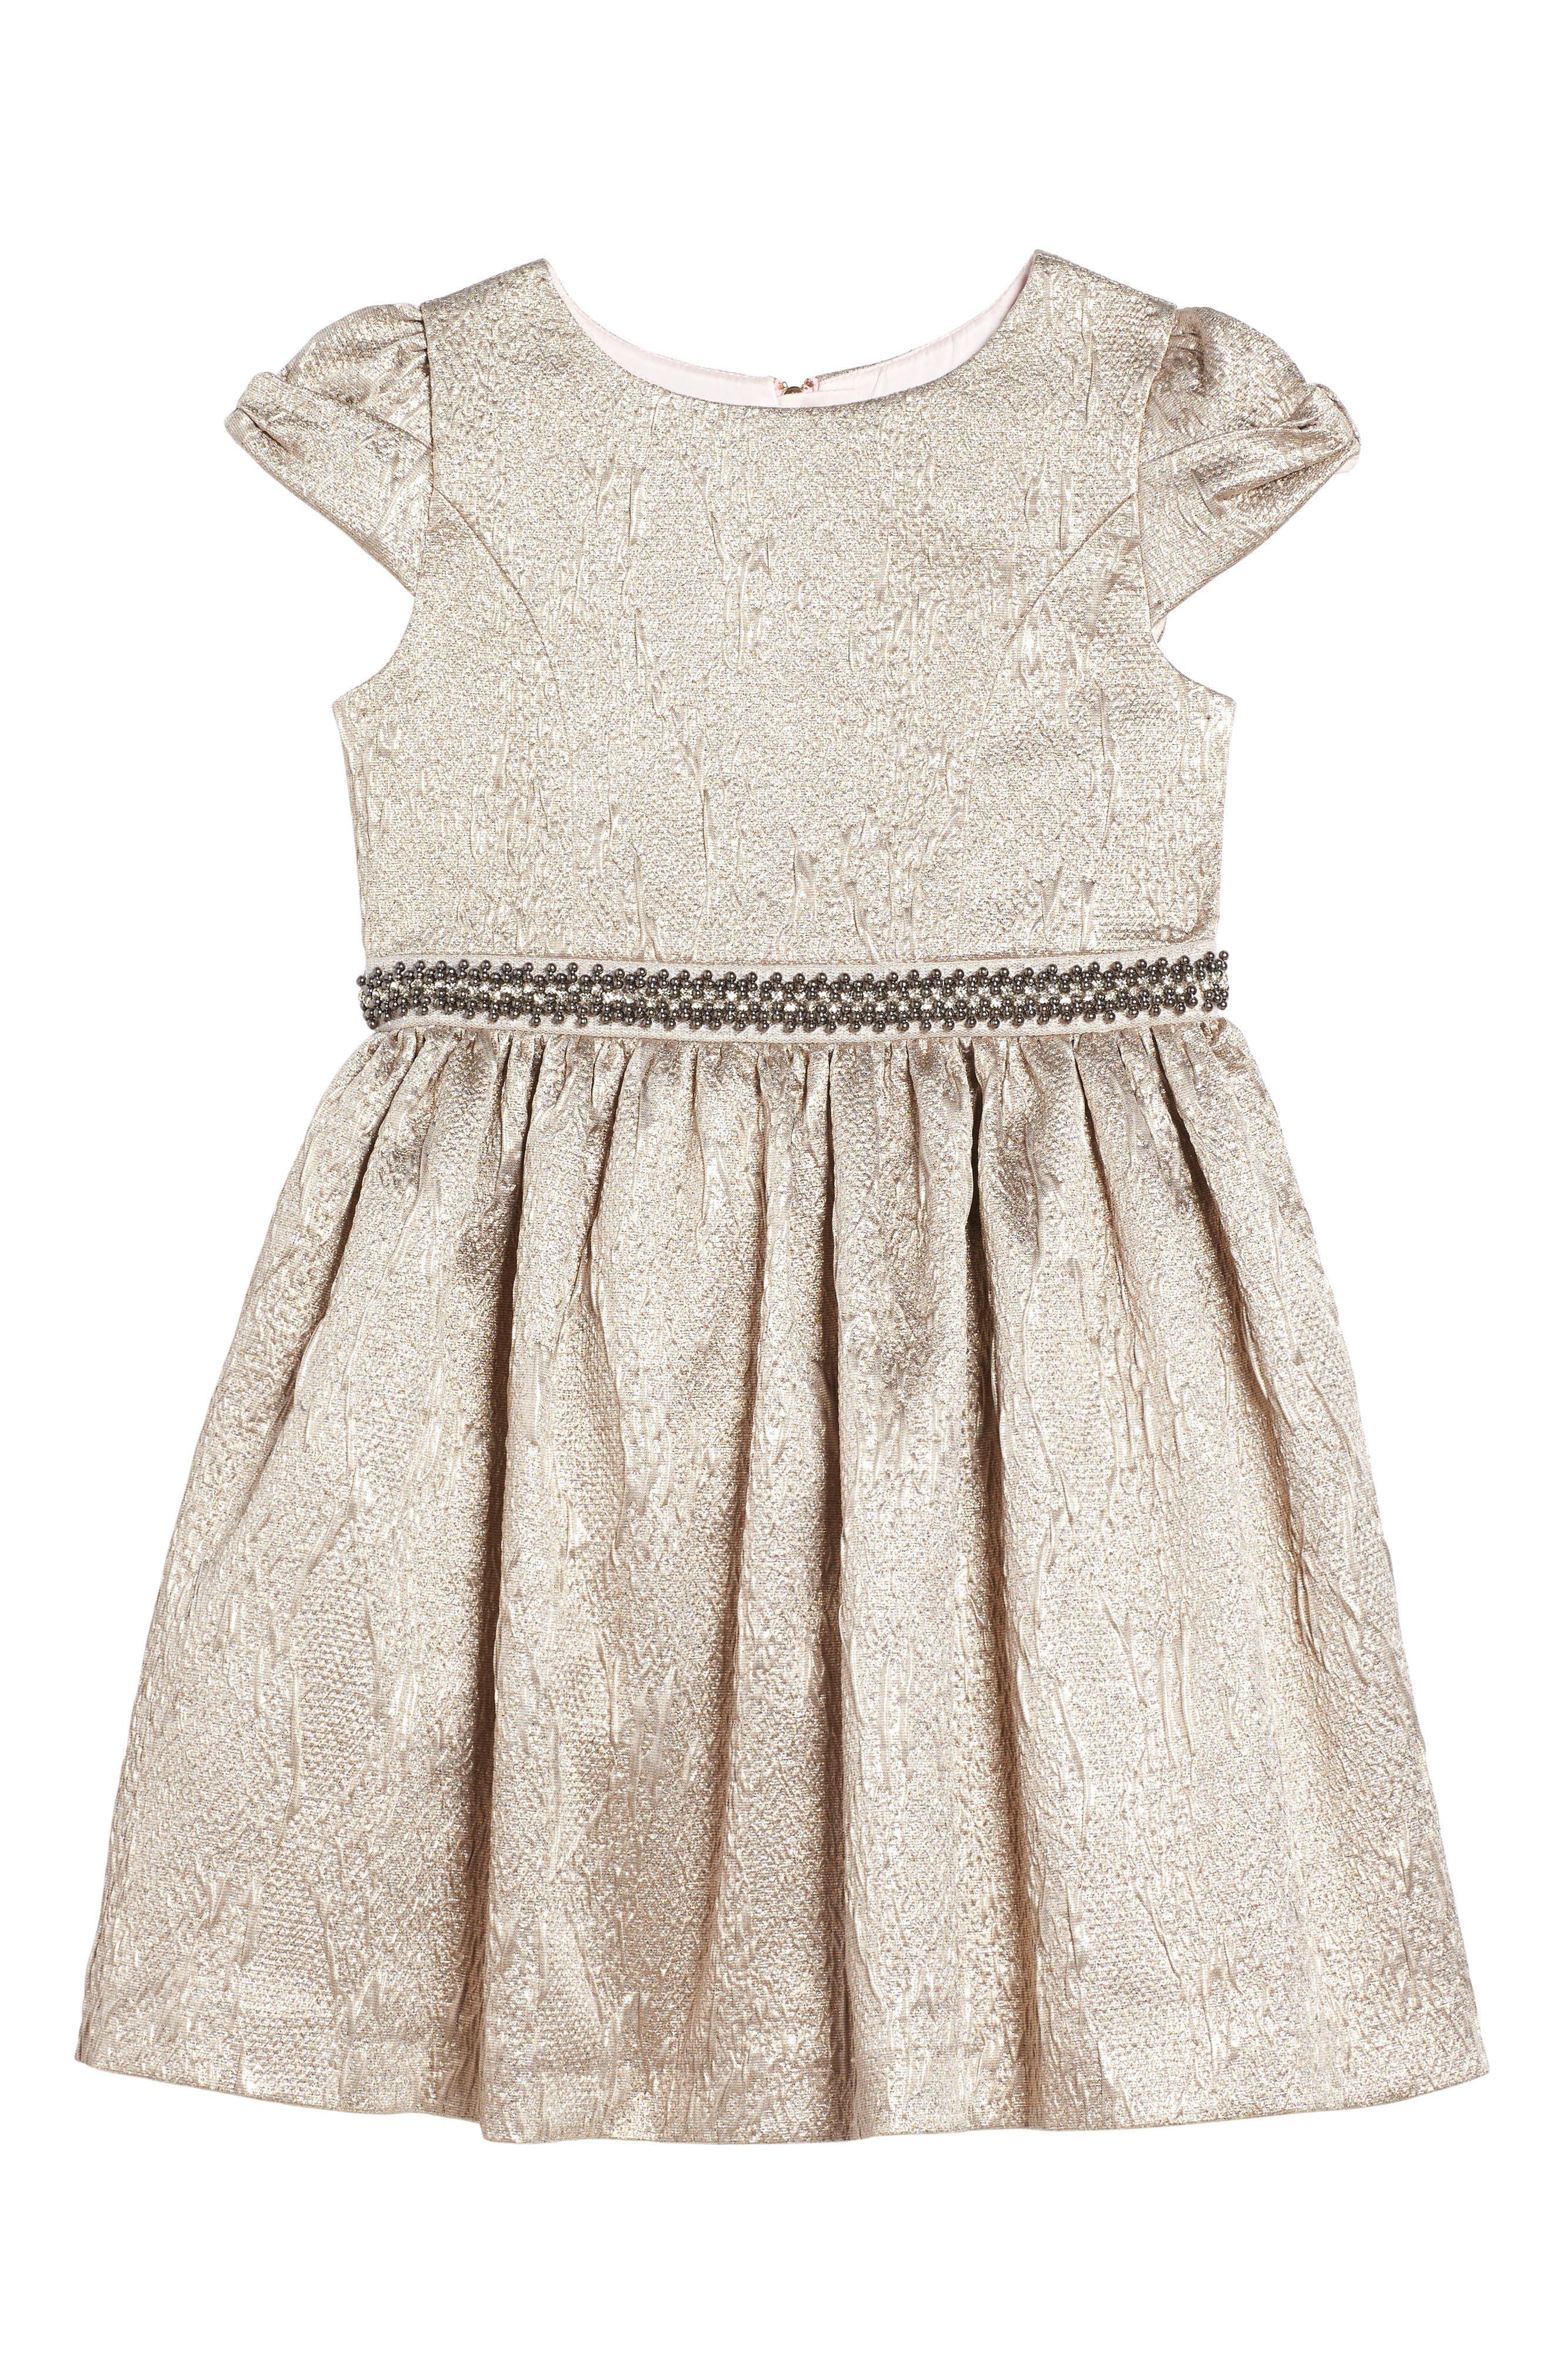 Oh My Jacquard Party Dress (Little Girls & Big Girls)